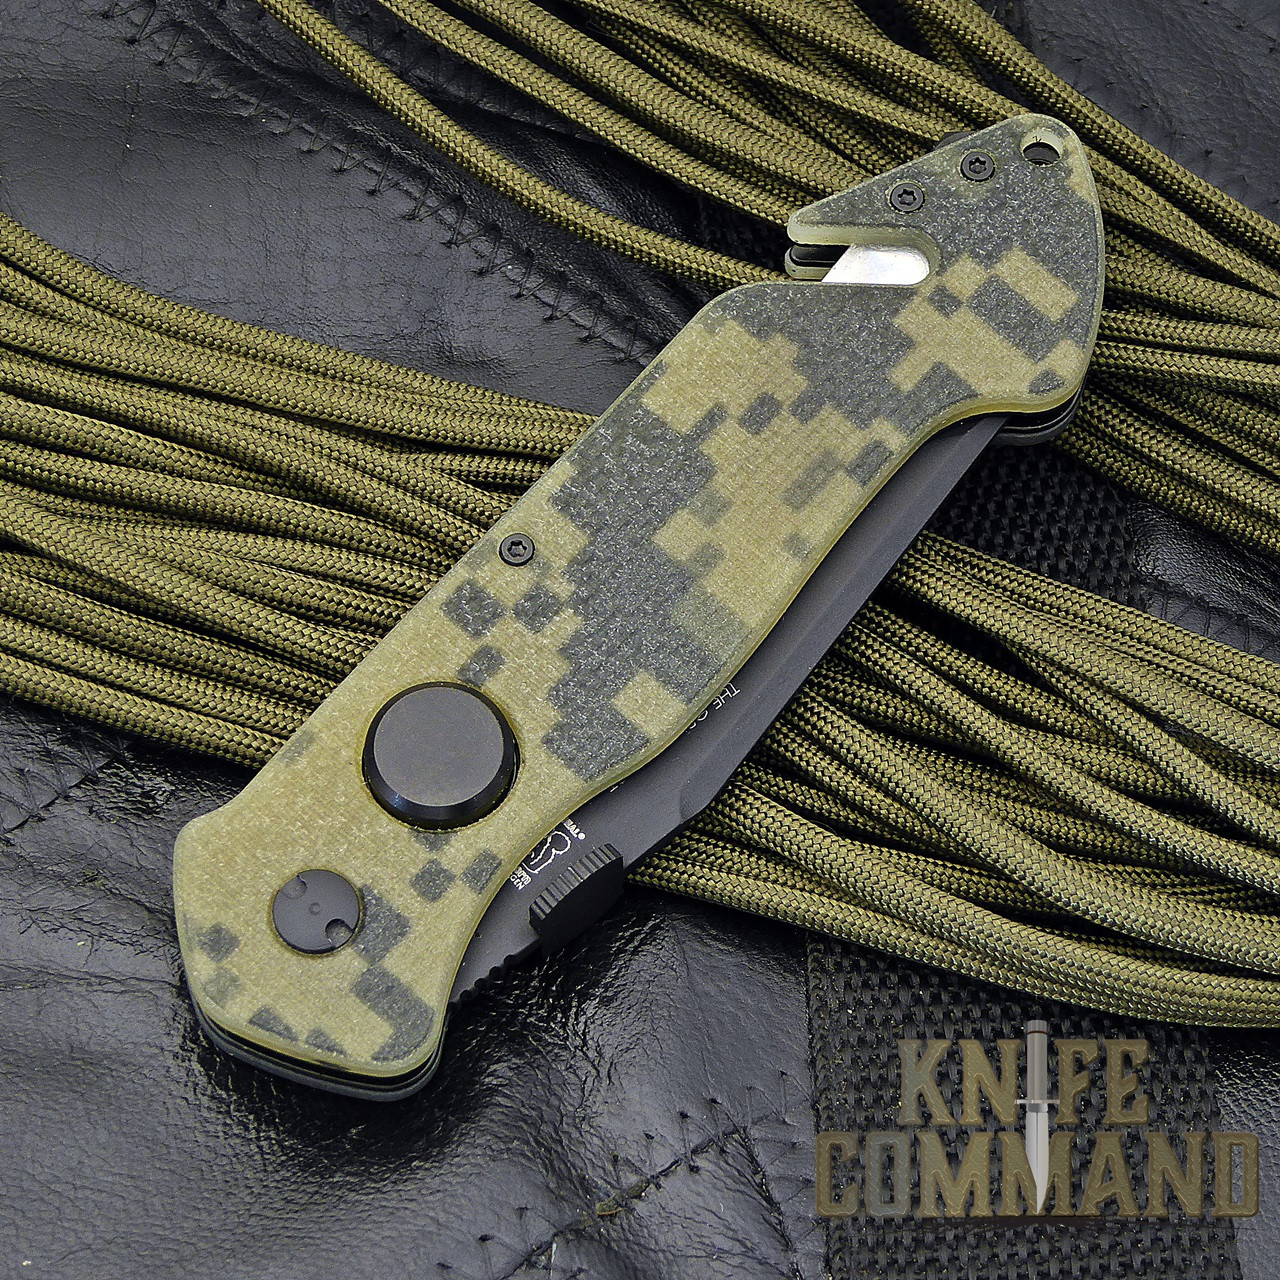 Eickhorn Solingen PRT X Digicam G10 Tanto Tactical Emergency Rescue Knife.  Large thumb button liner lock release.